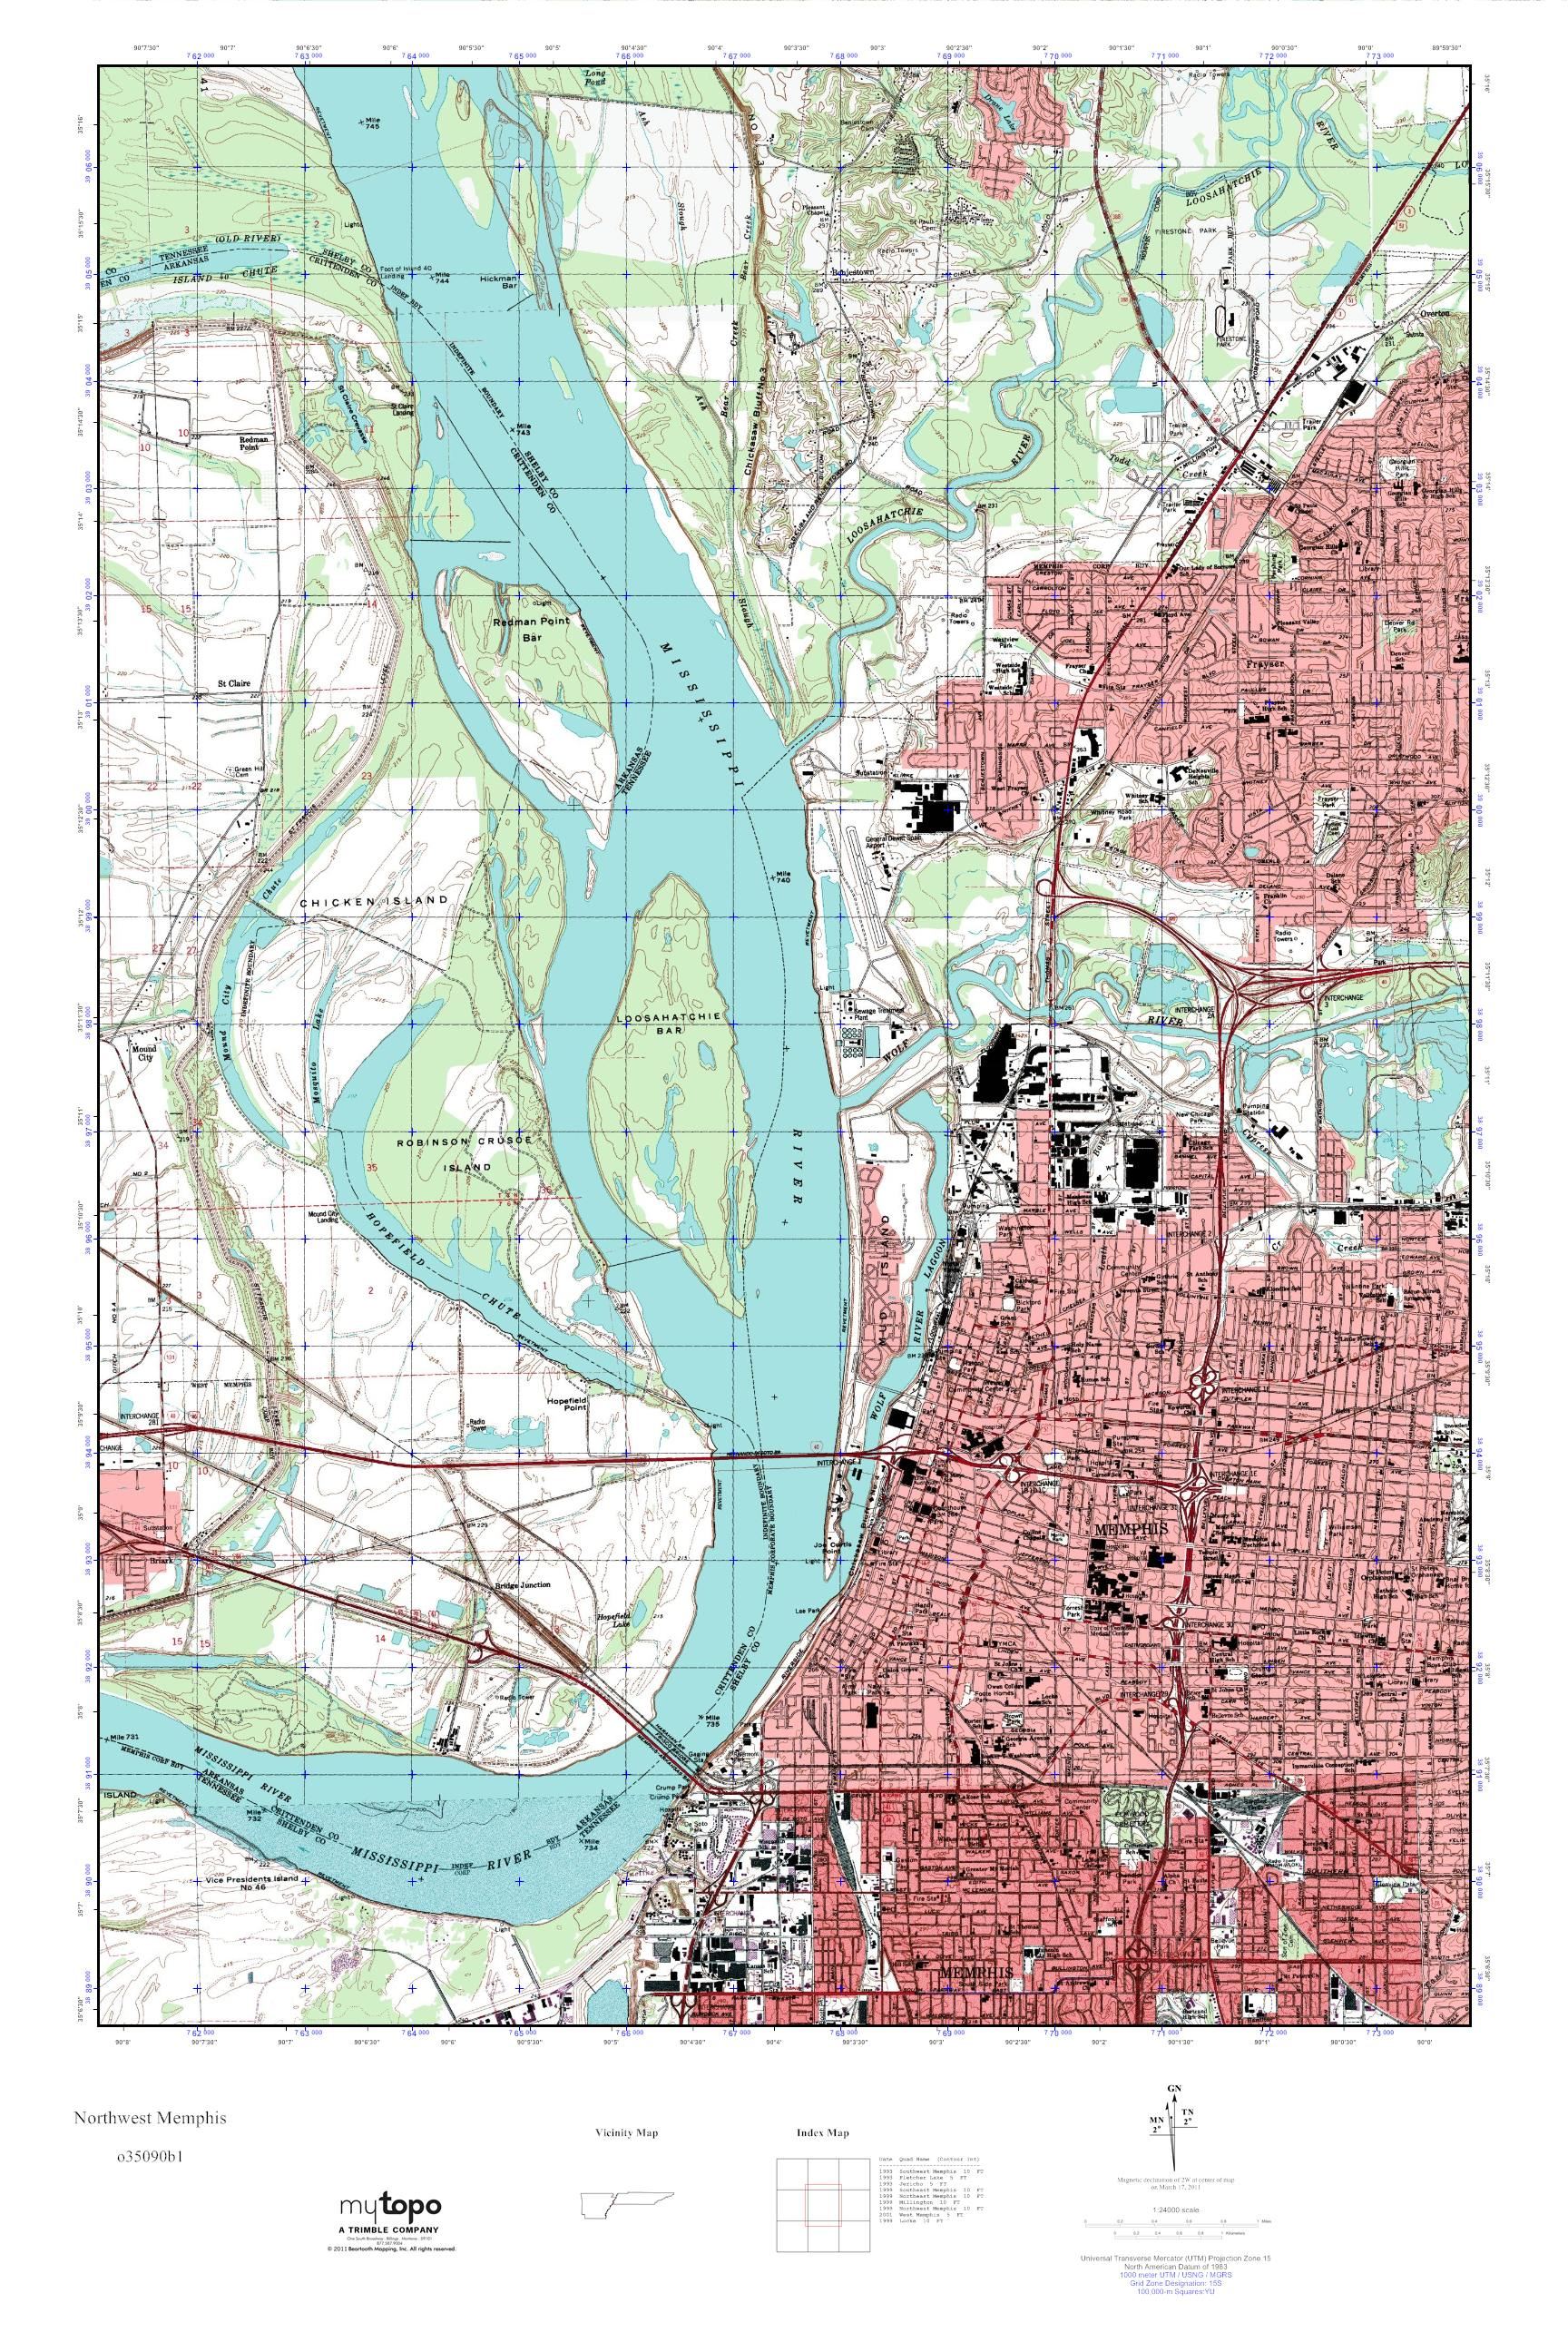 MyTopo Northwest Memphis, Tennessee USGS Quad Topo Map